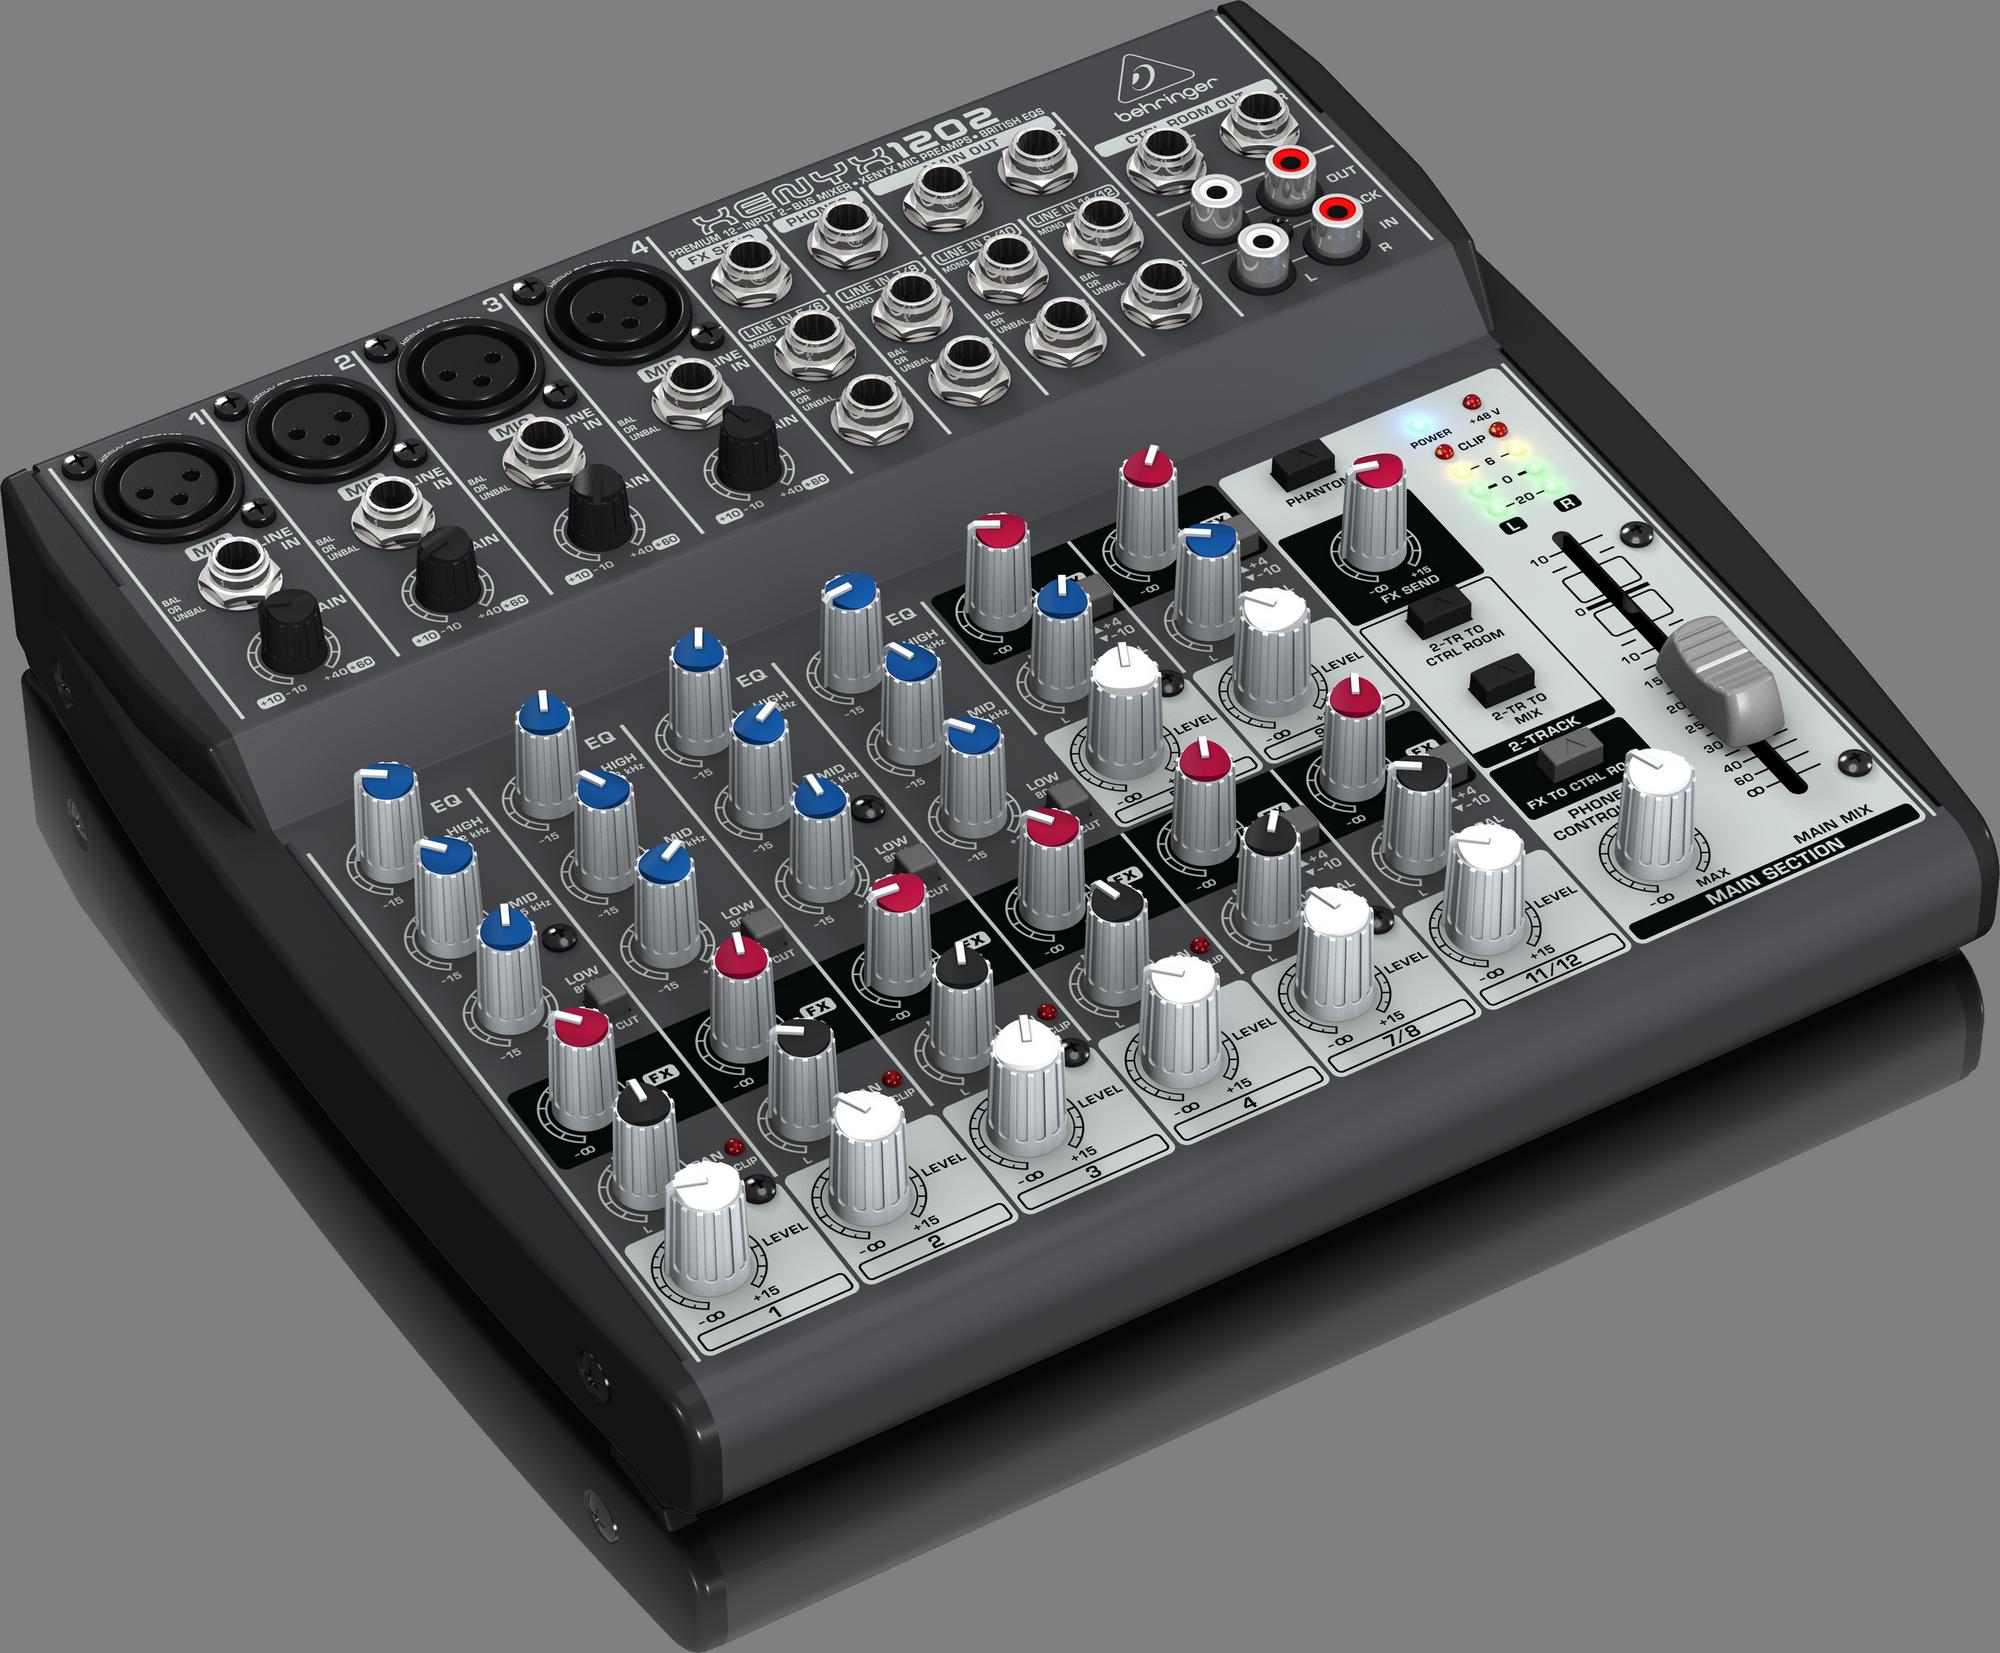 Behringer XENYX 1202 - Analog Mixer